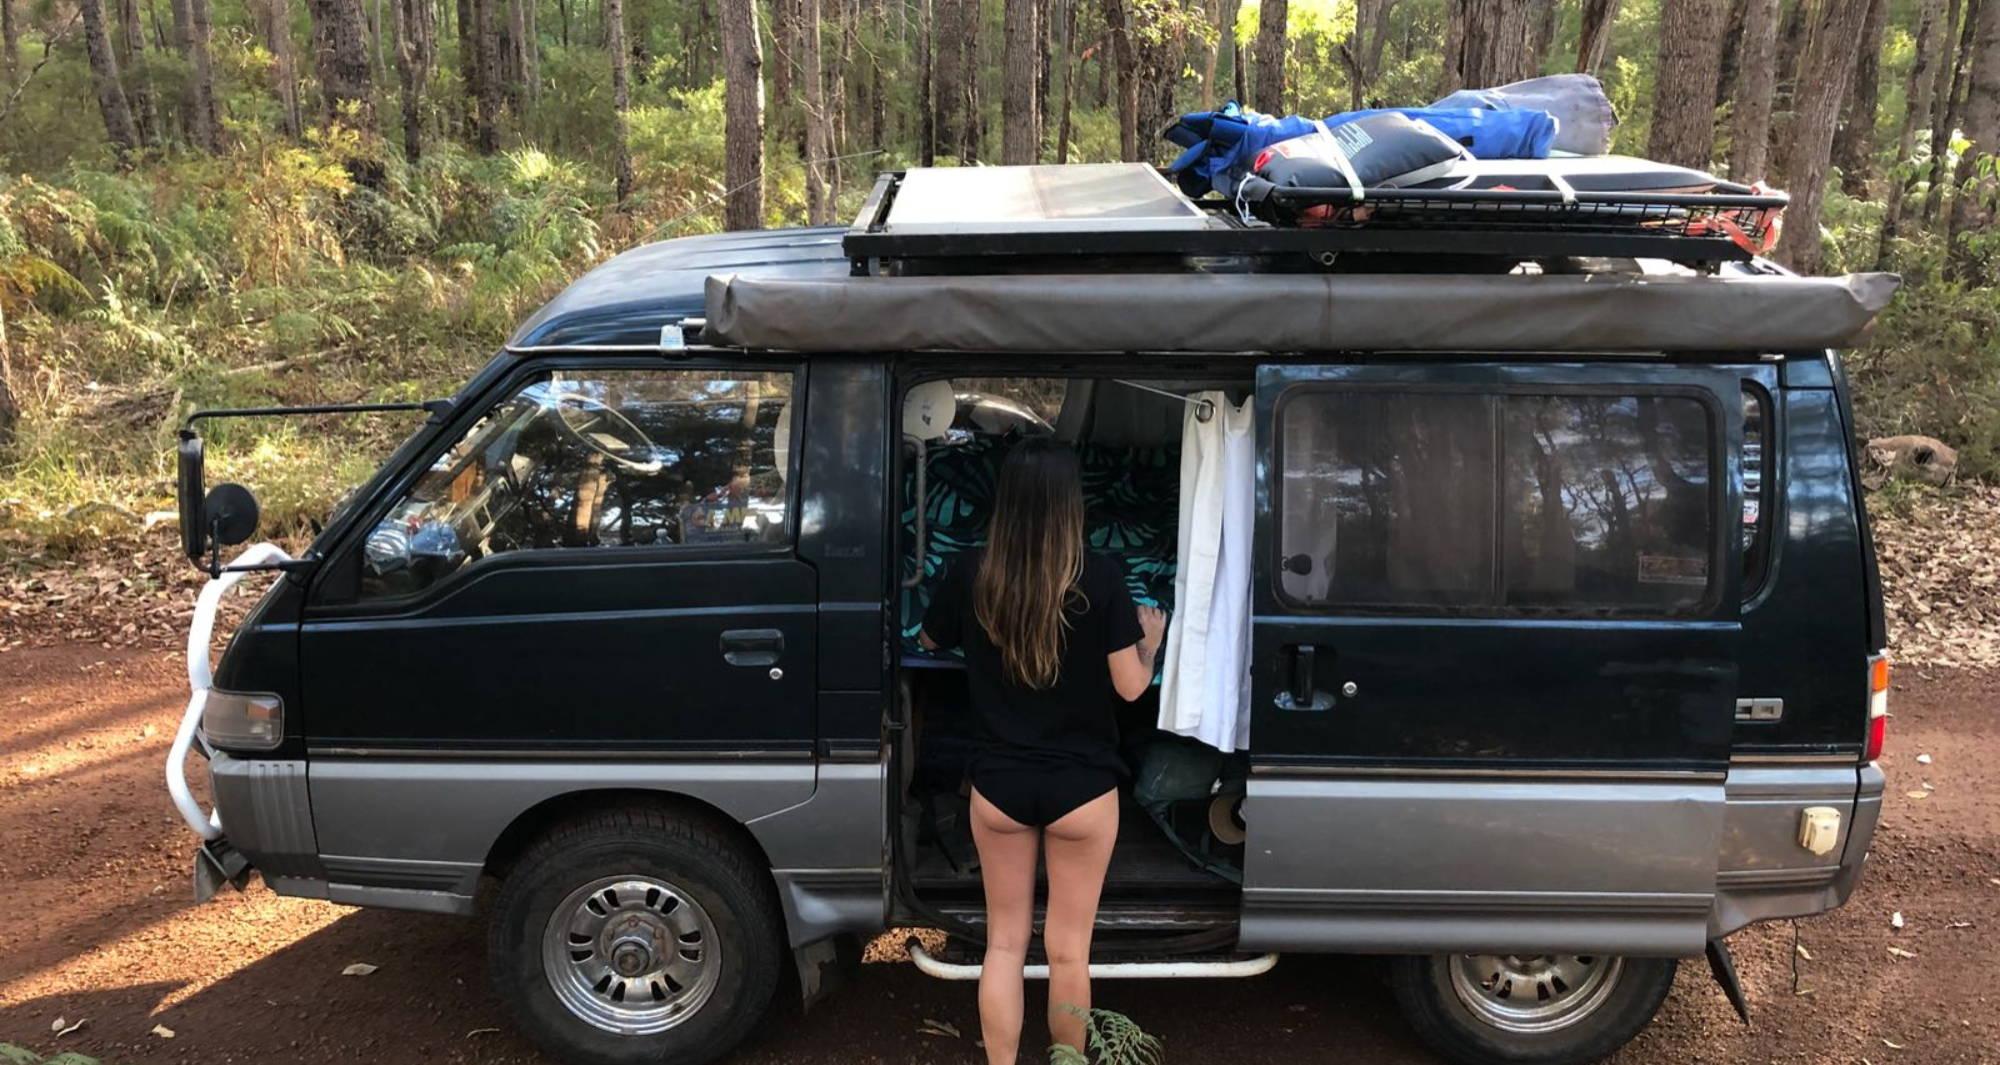 Woman standing in WAMA underwear packing camping essentials in her camper van.